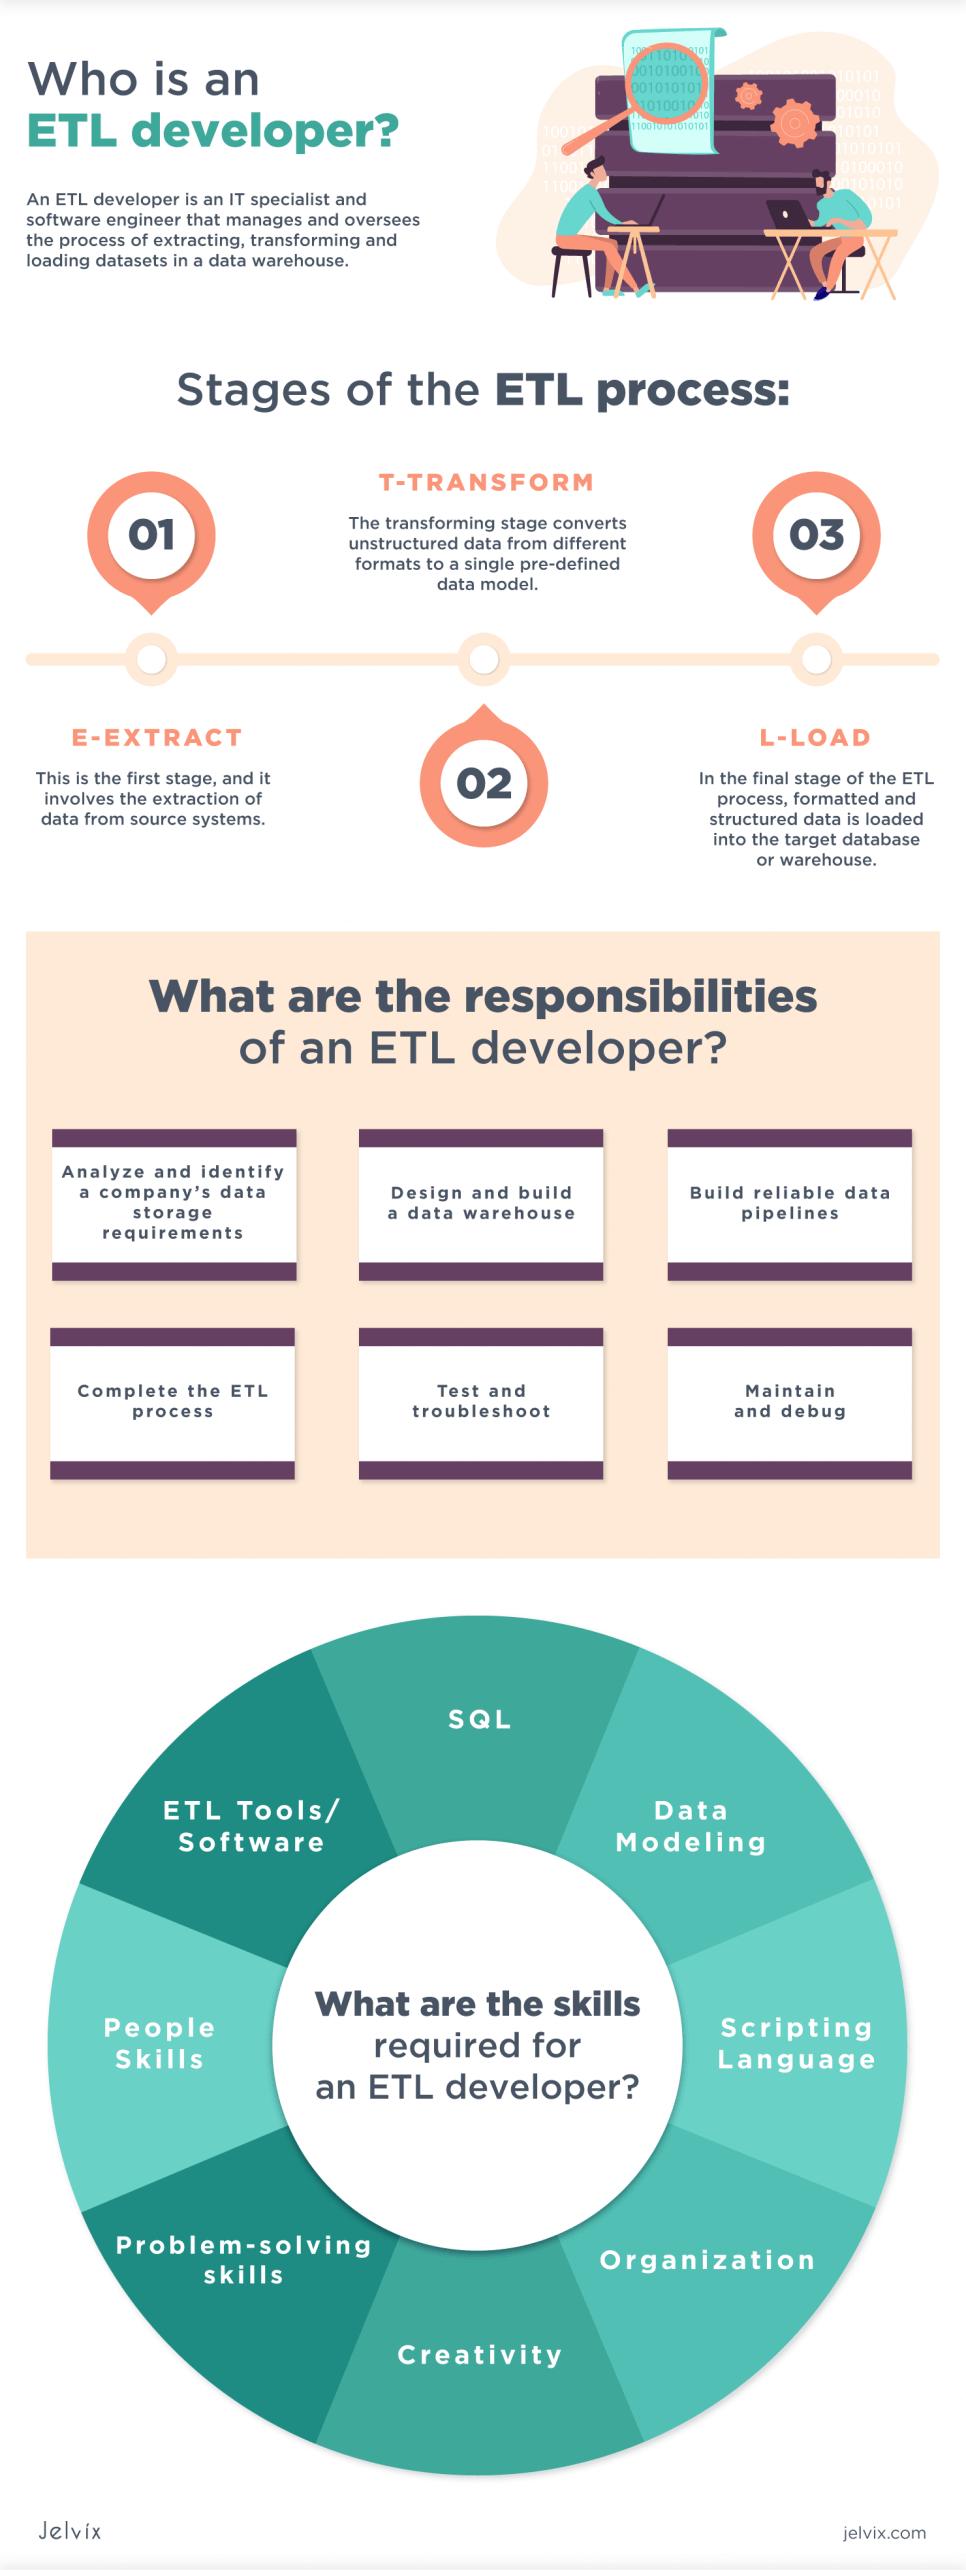 roles of ETL developers